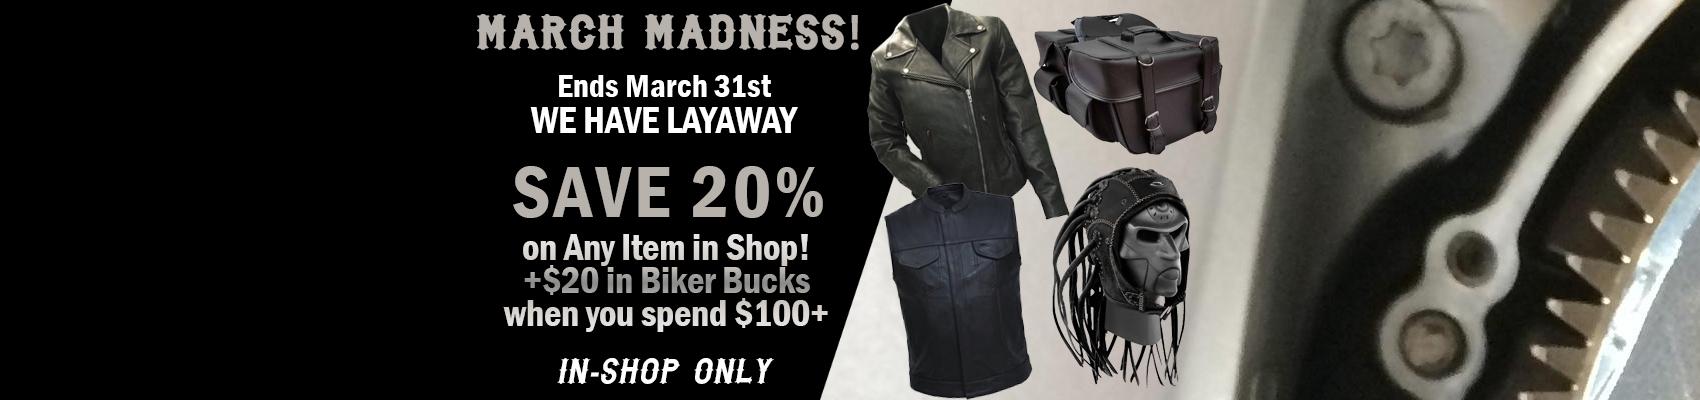 March Madness Biker Gear Sale